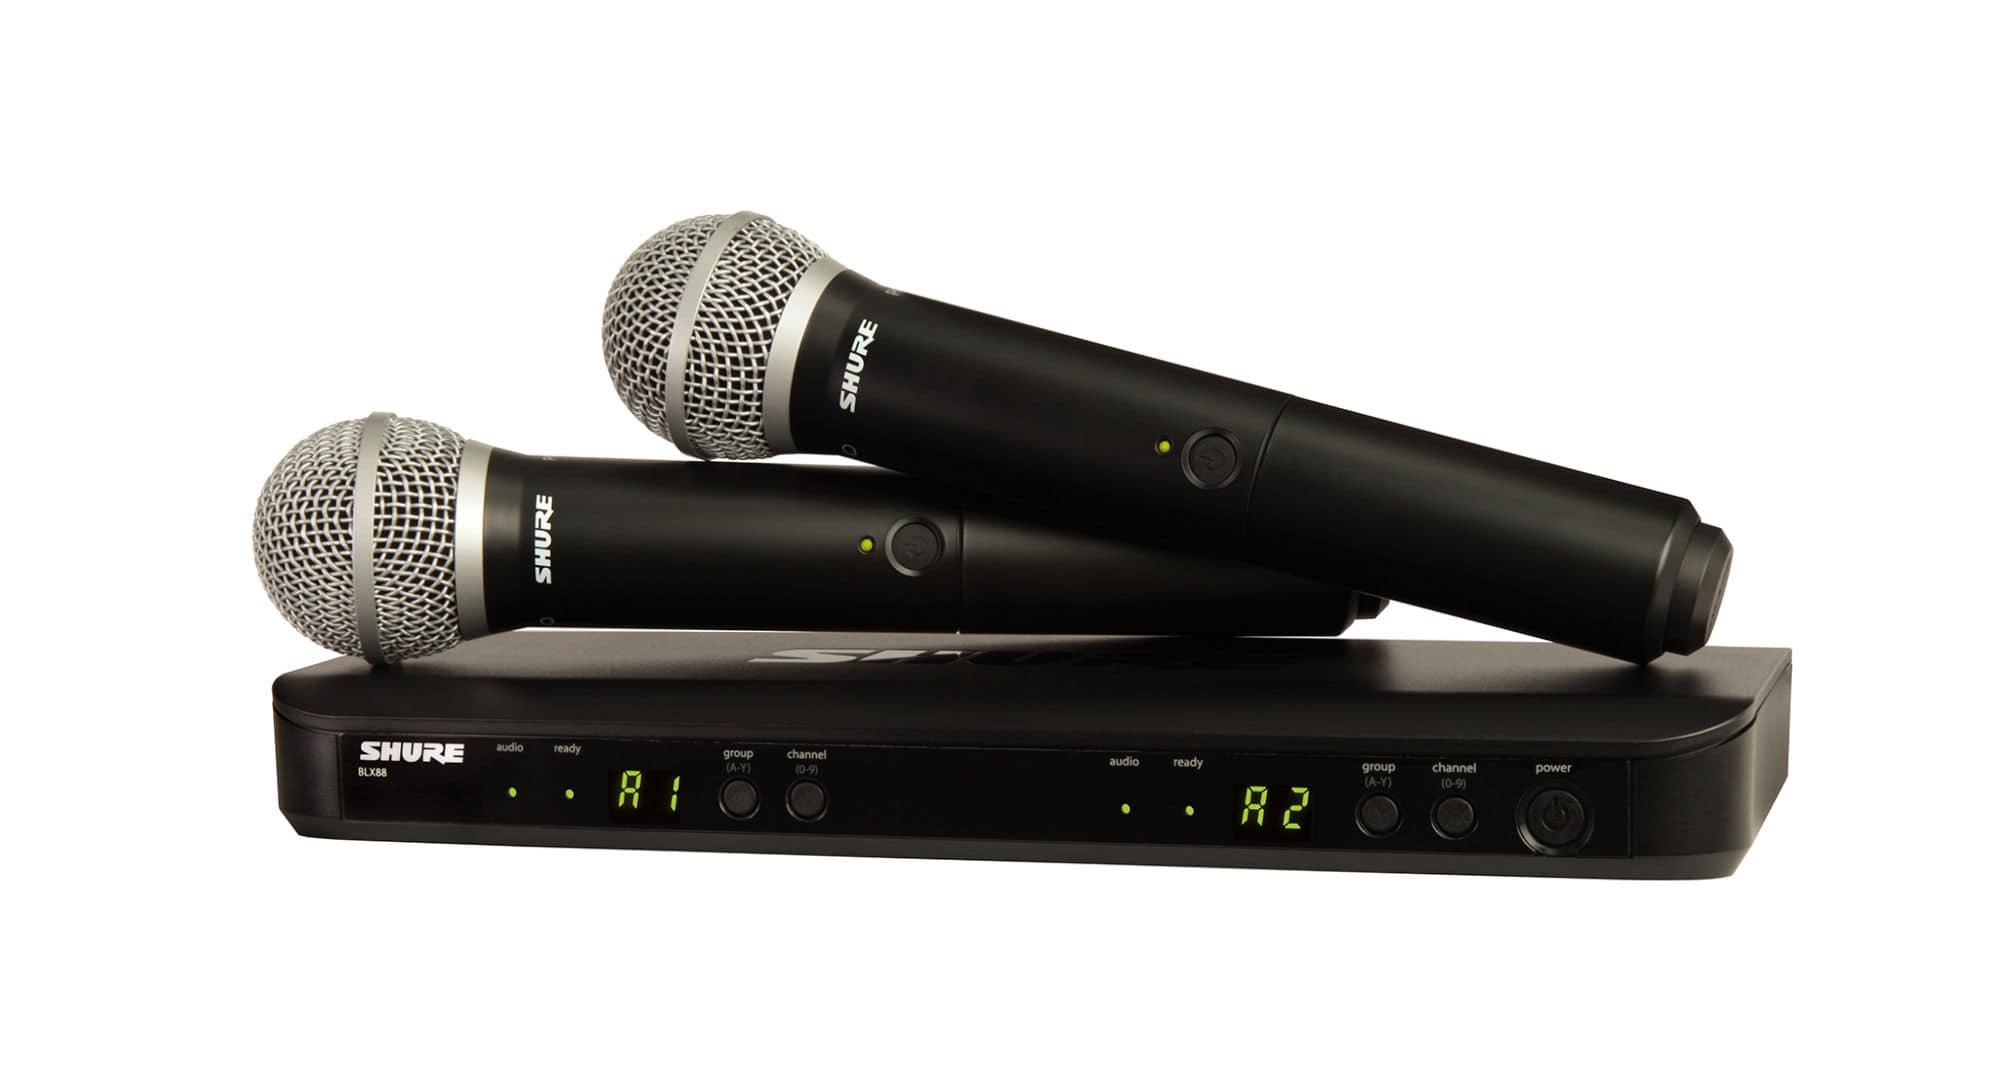 Drahtlossysteme - Shure BLX288 PG58 S8 Dual Vocal Funksystem - Onlineshop Musikhaus Kirstein